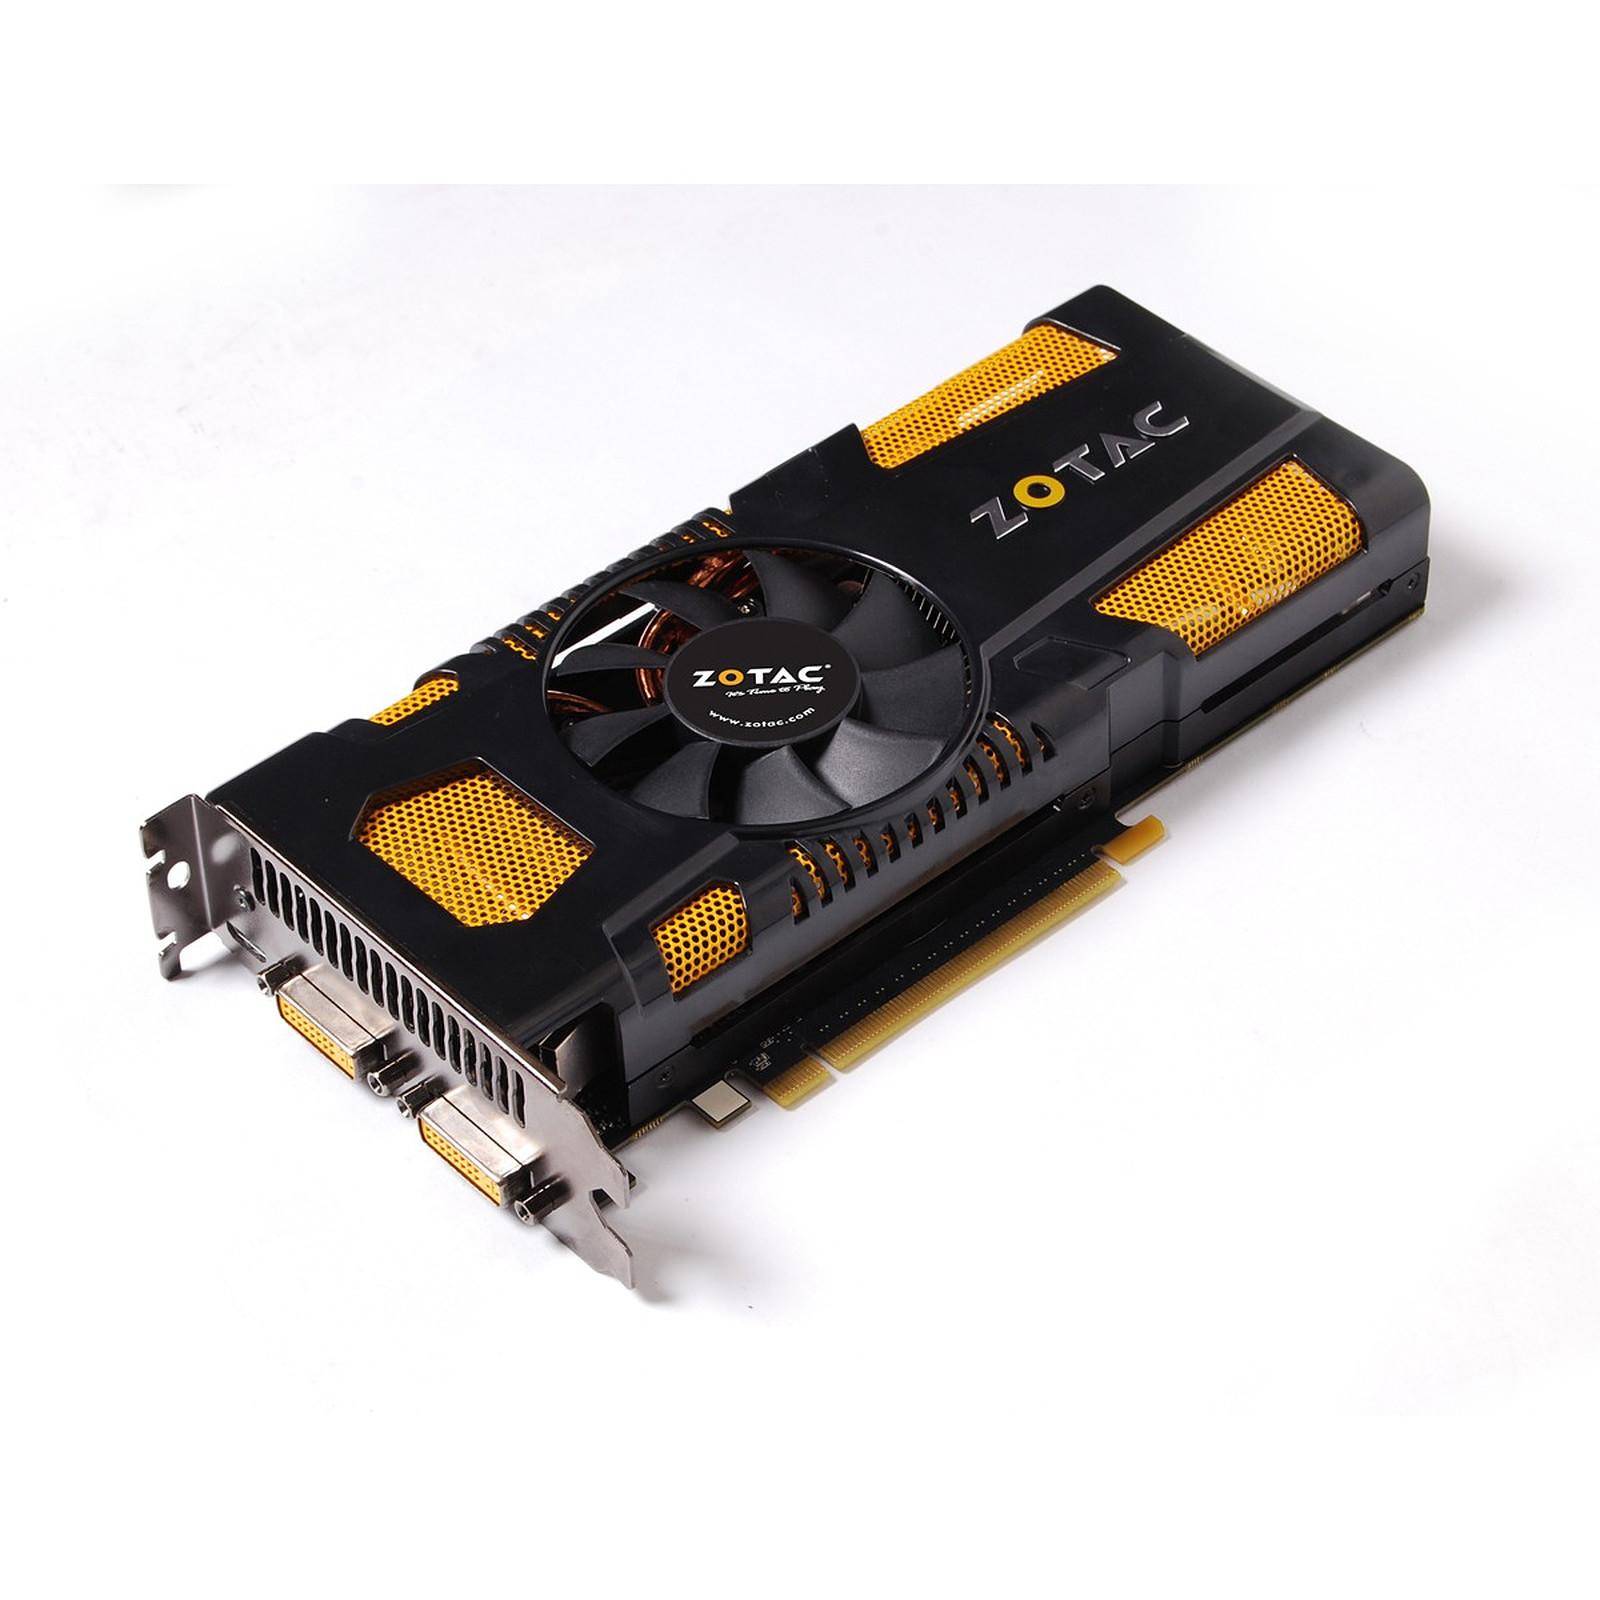 ZOTAC GeForce GTX560 Ti AMP! Edition 1024MB